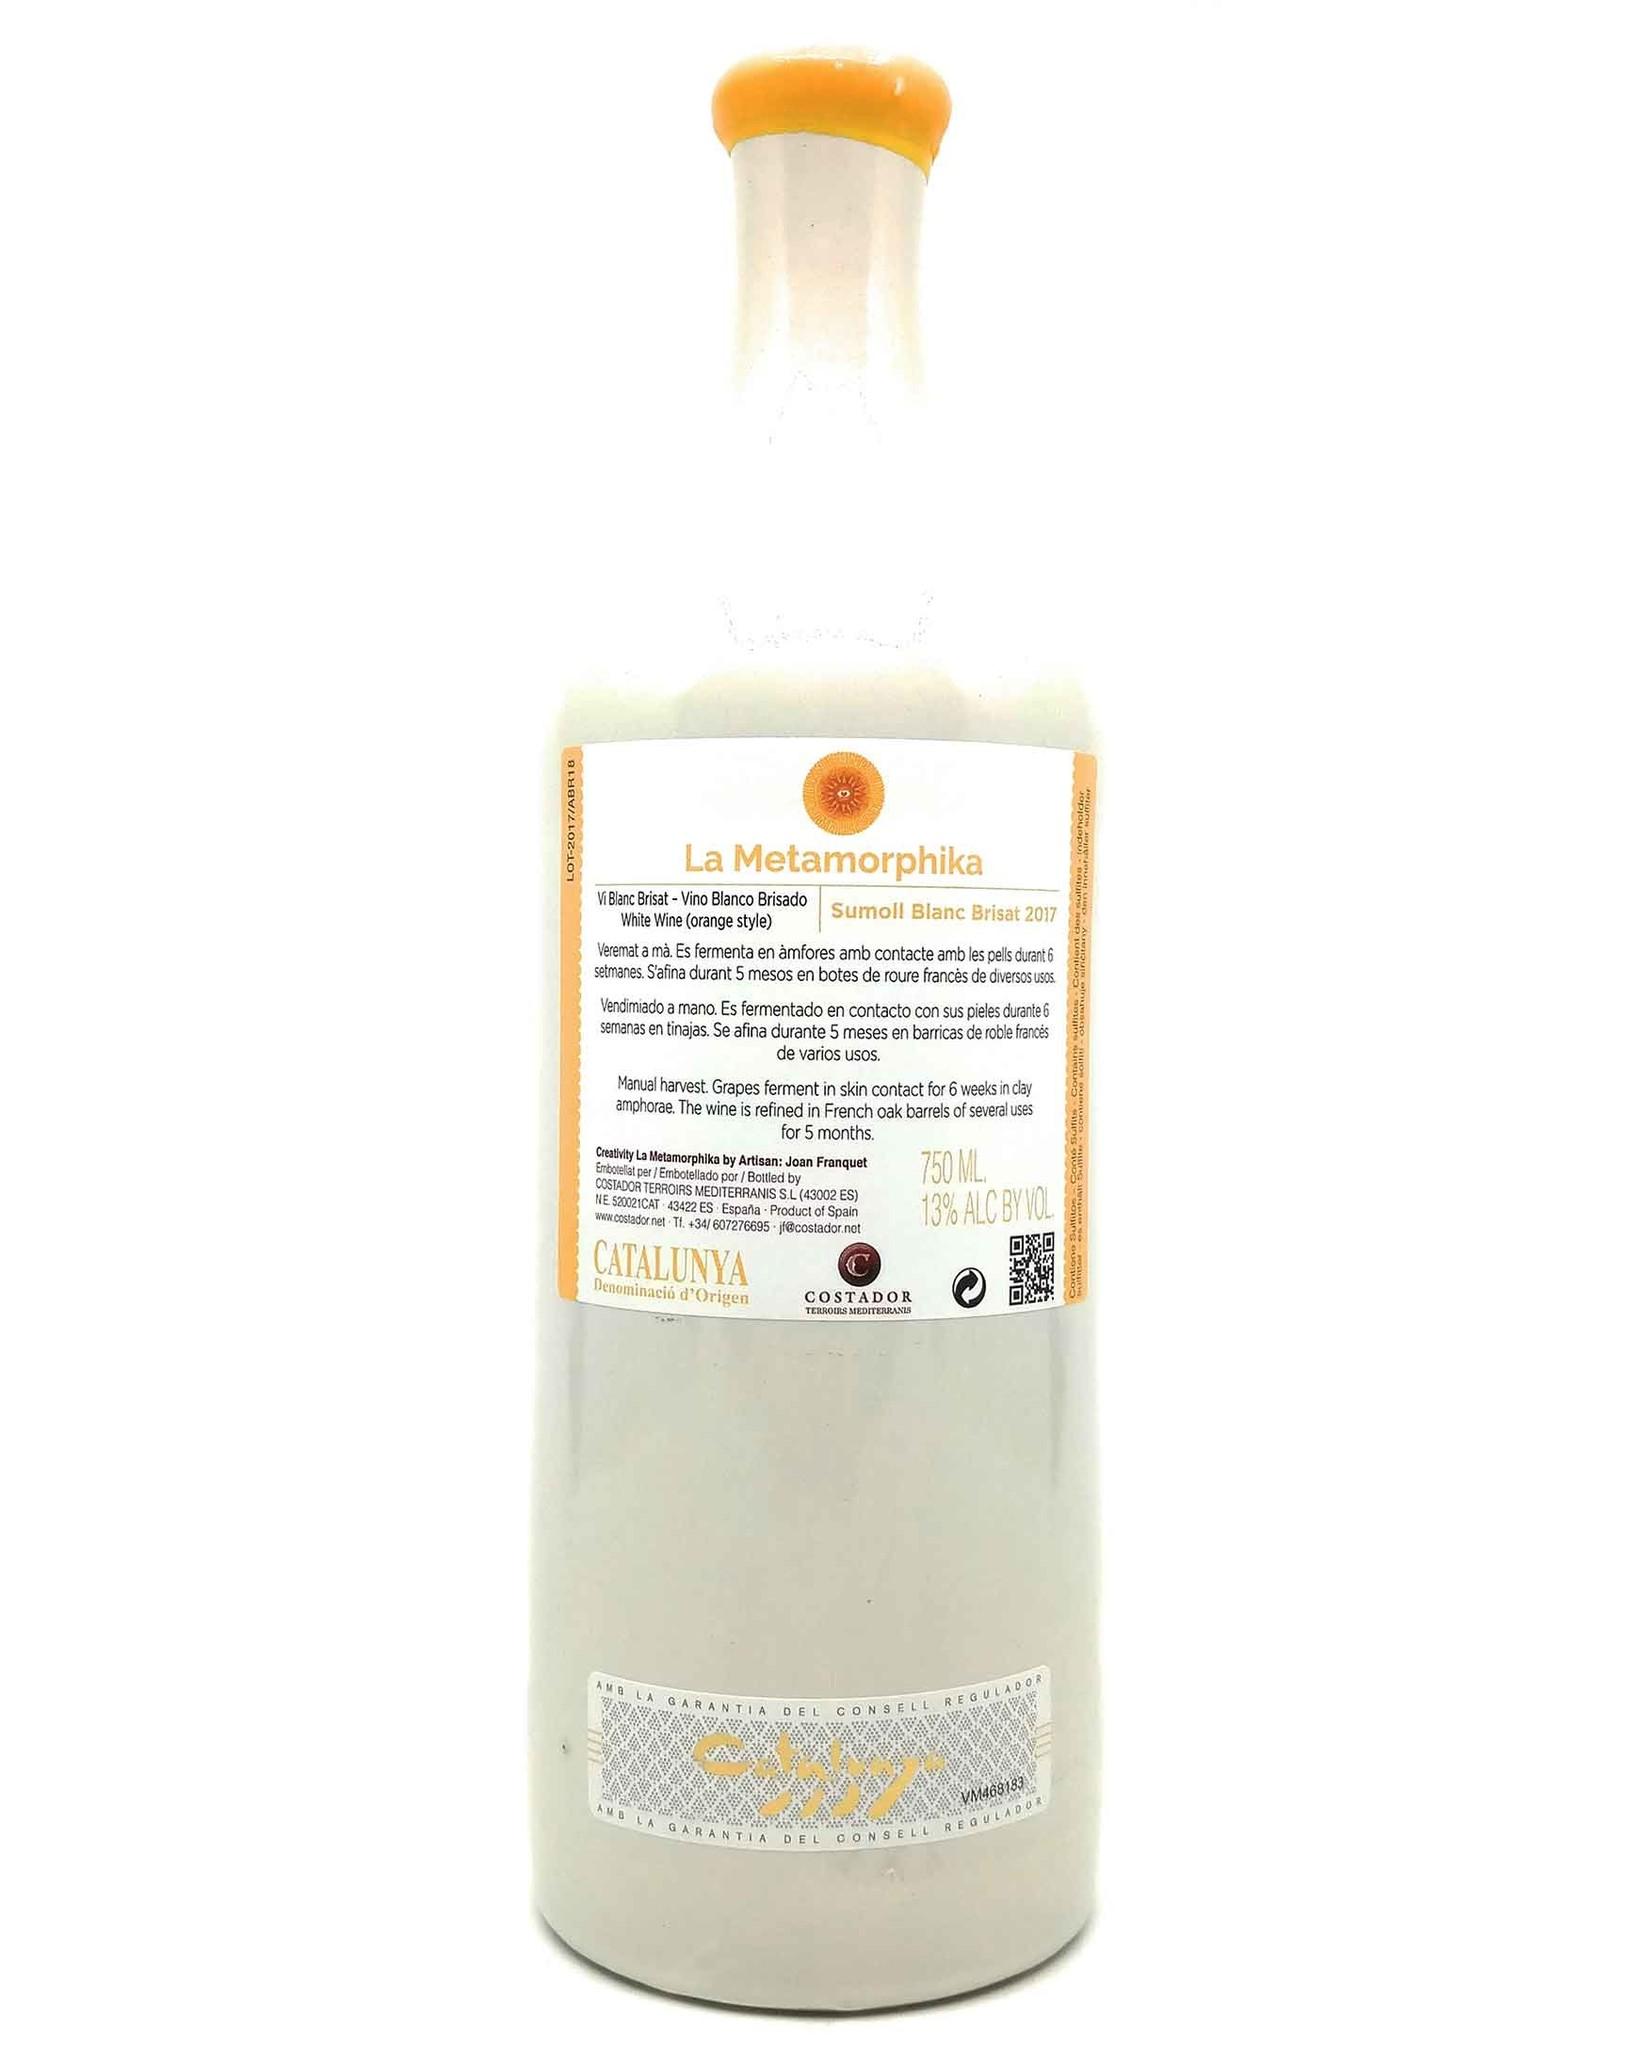 Costador-Metamorphika Sumoll Blanc Brisat 2017